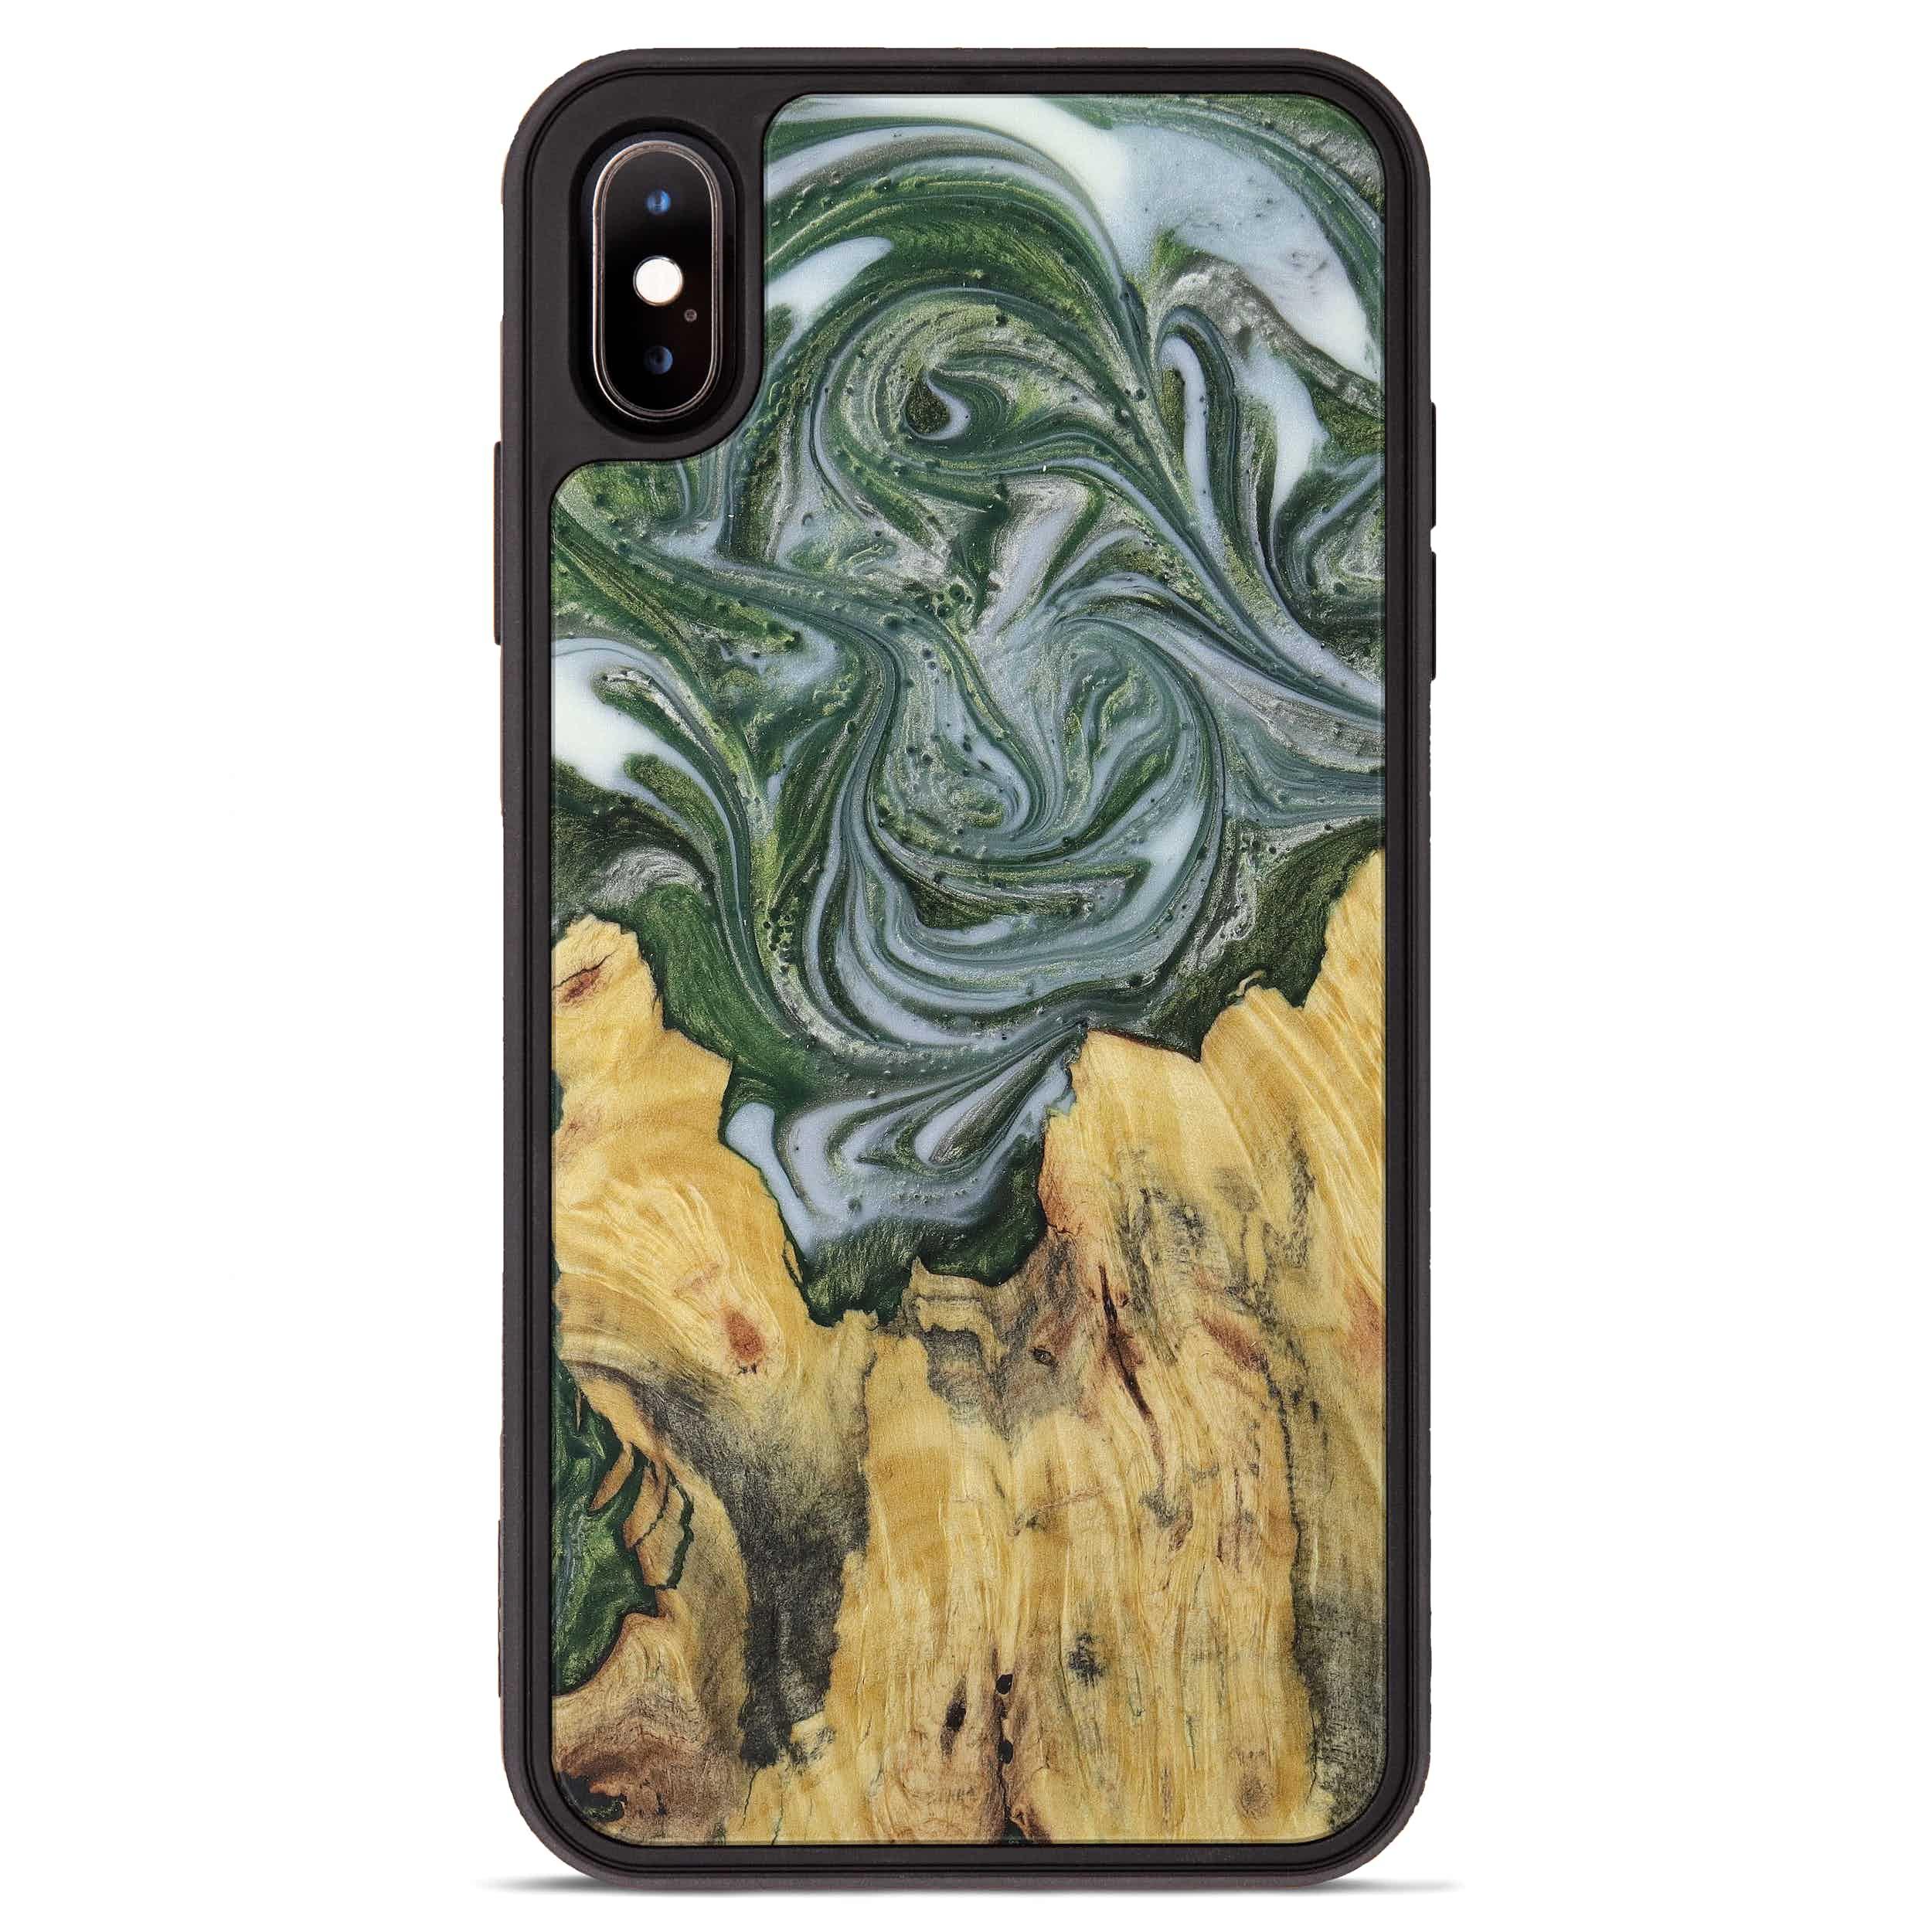 iPhone Xs Max Wood+Resin Phone Case - Armando (Dark Green, 396001)